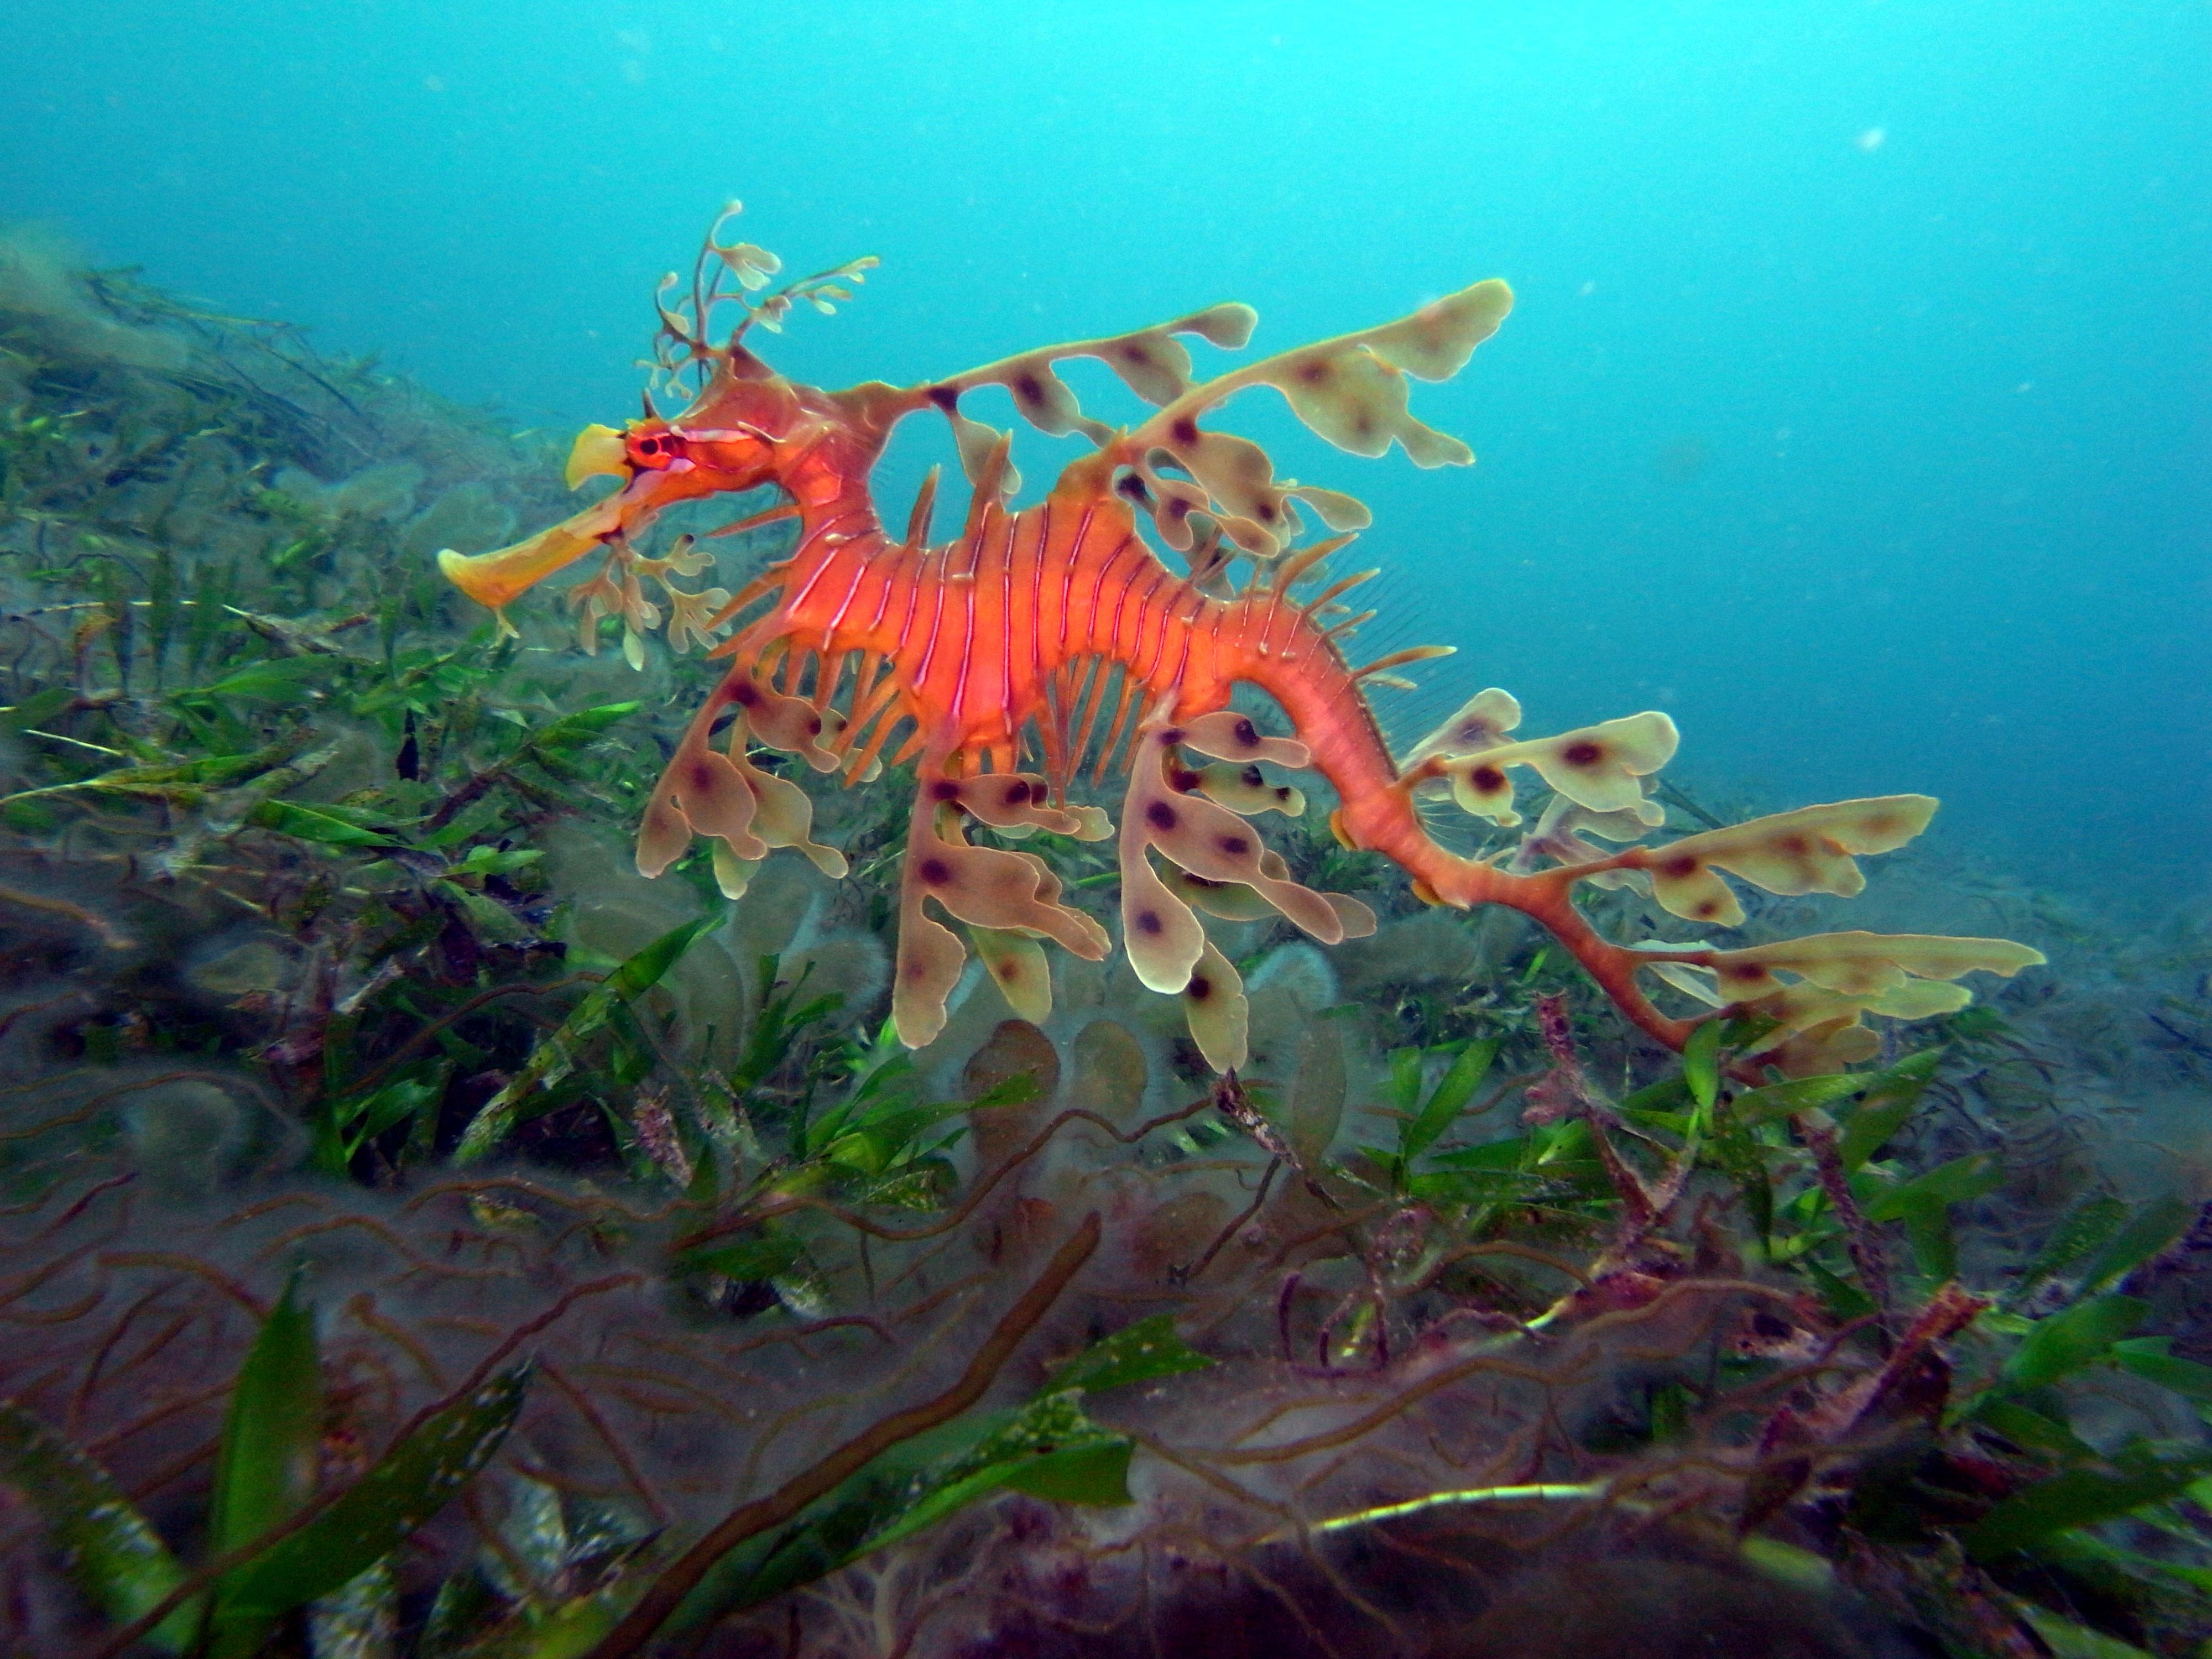 https://upload.wikimedia.org/wikipedia/commons/b/b2/Leafy_Sea_Dragon-Phycodurus_eques_%2823694746864%29.jpg